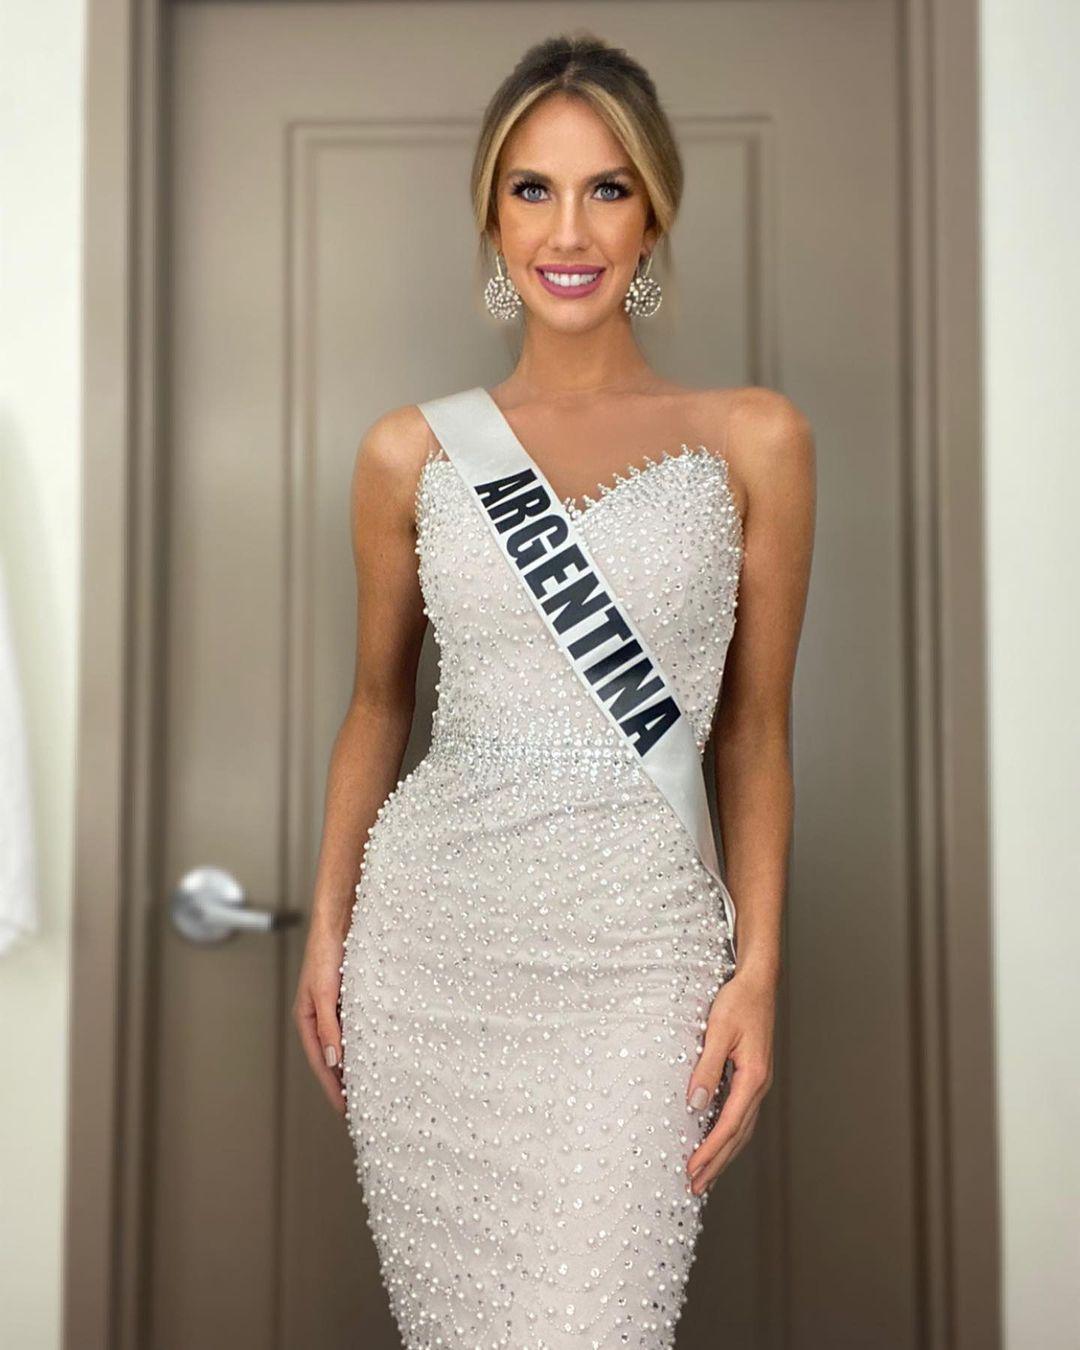 alina akselrad, top 21 de miss universe 2020. - Página 12 20750216